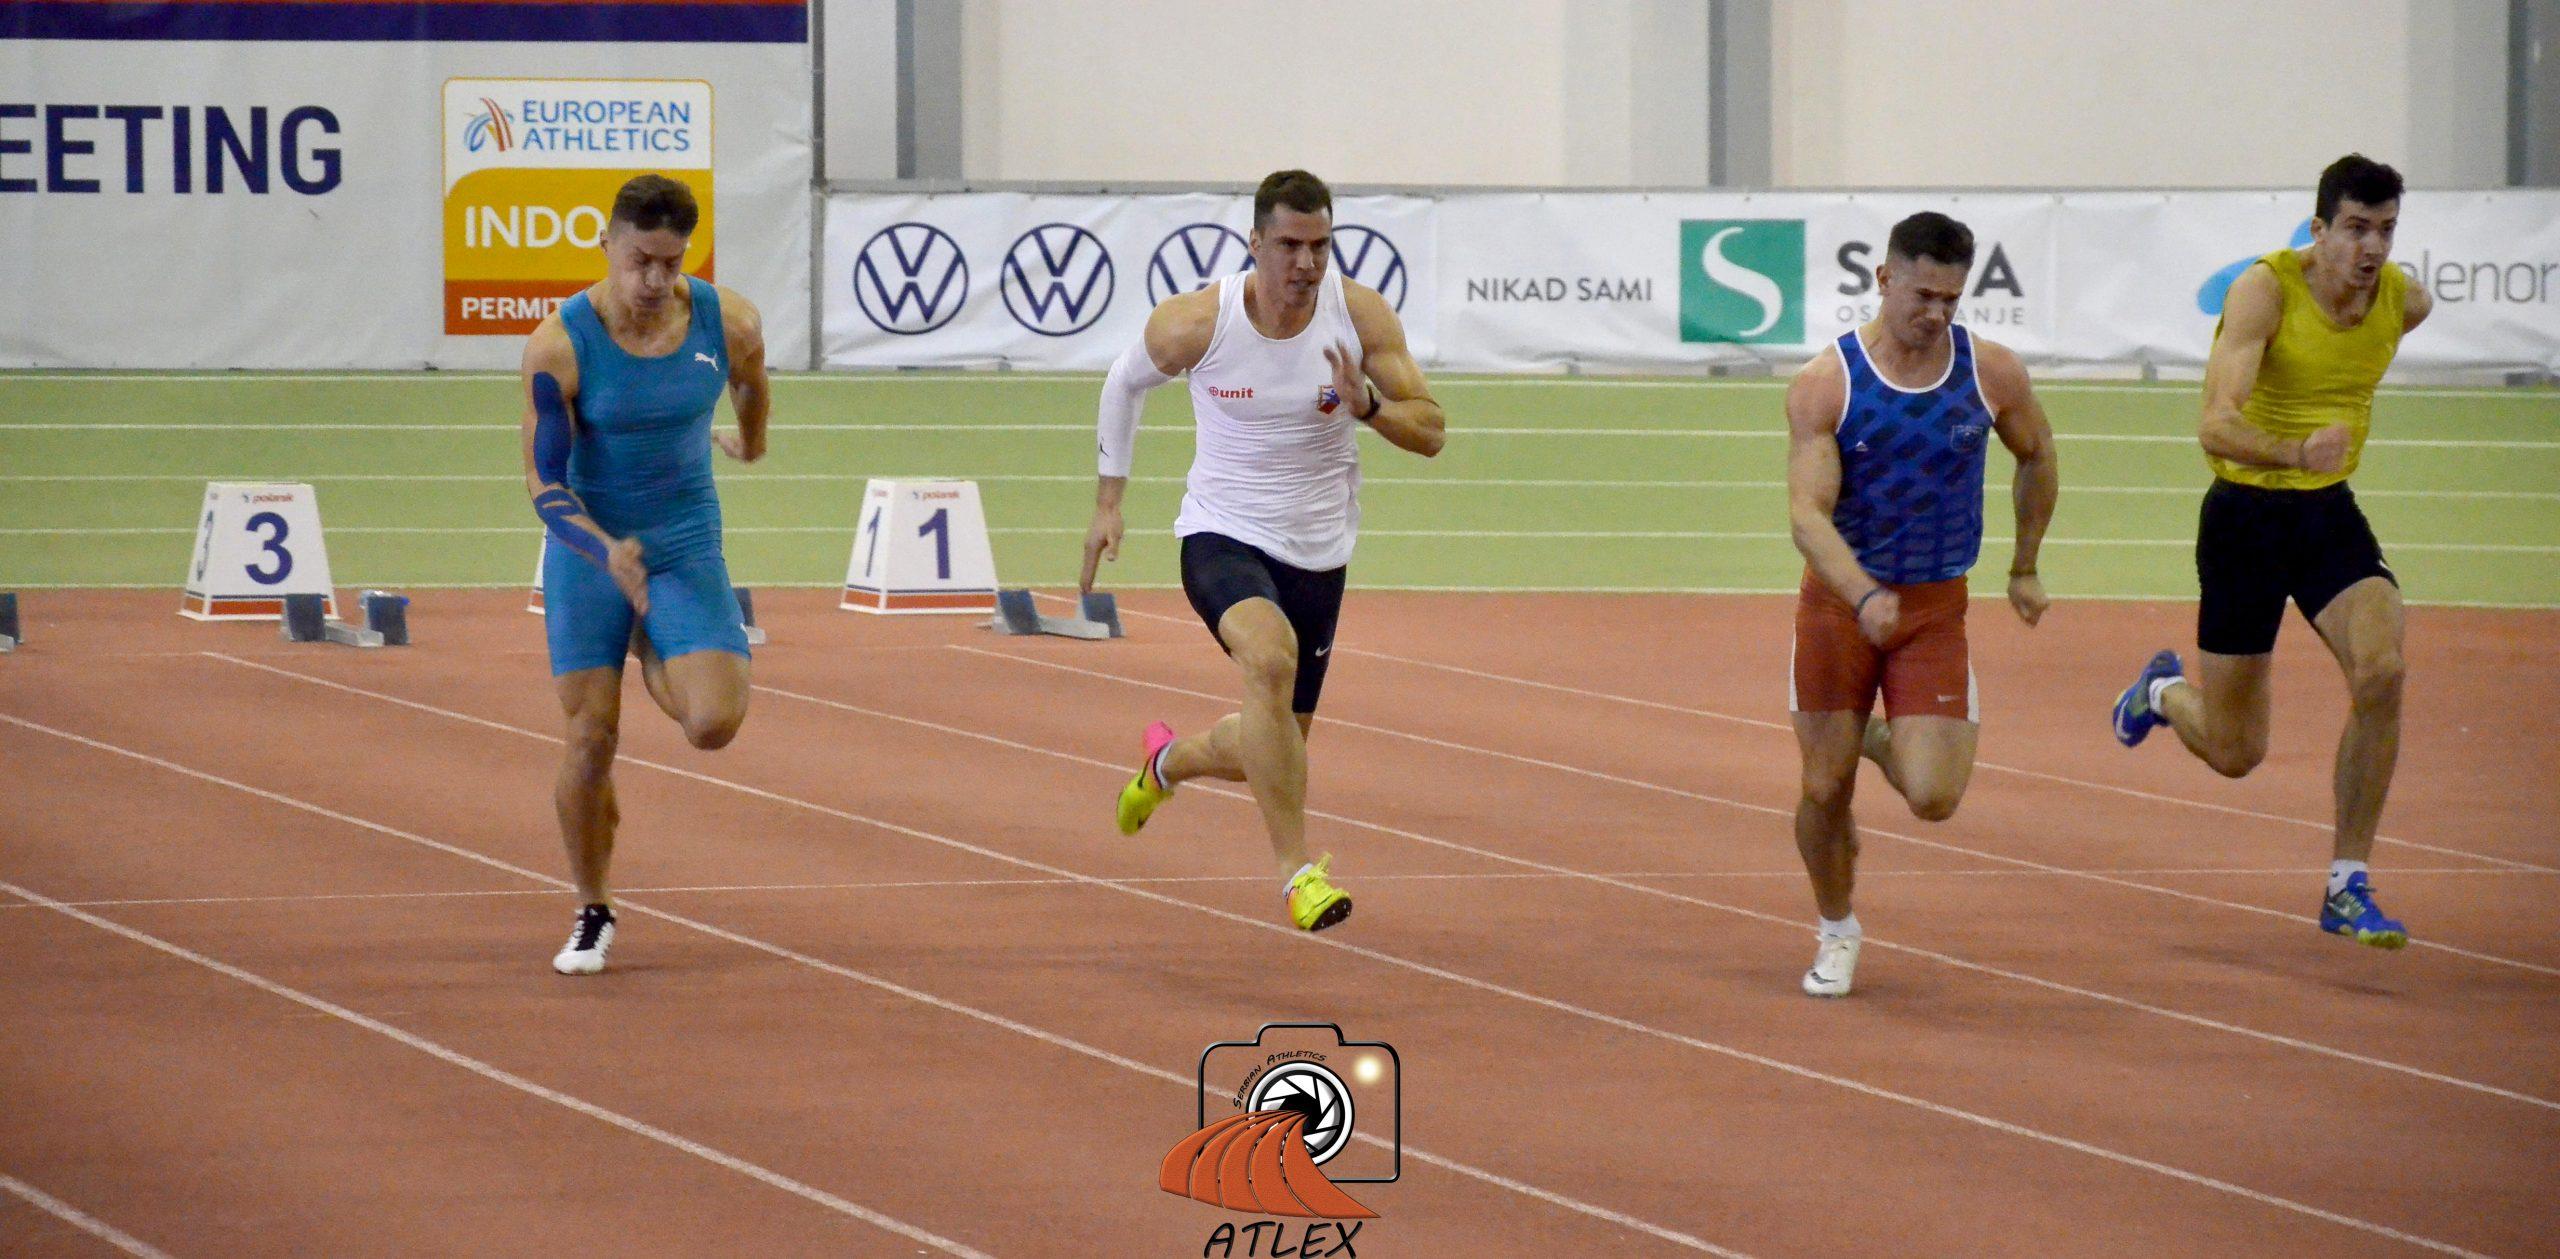 Mihail Dudaš, 60 metara